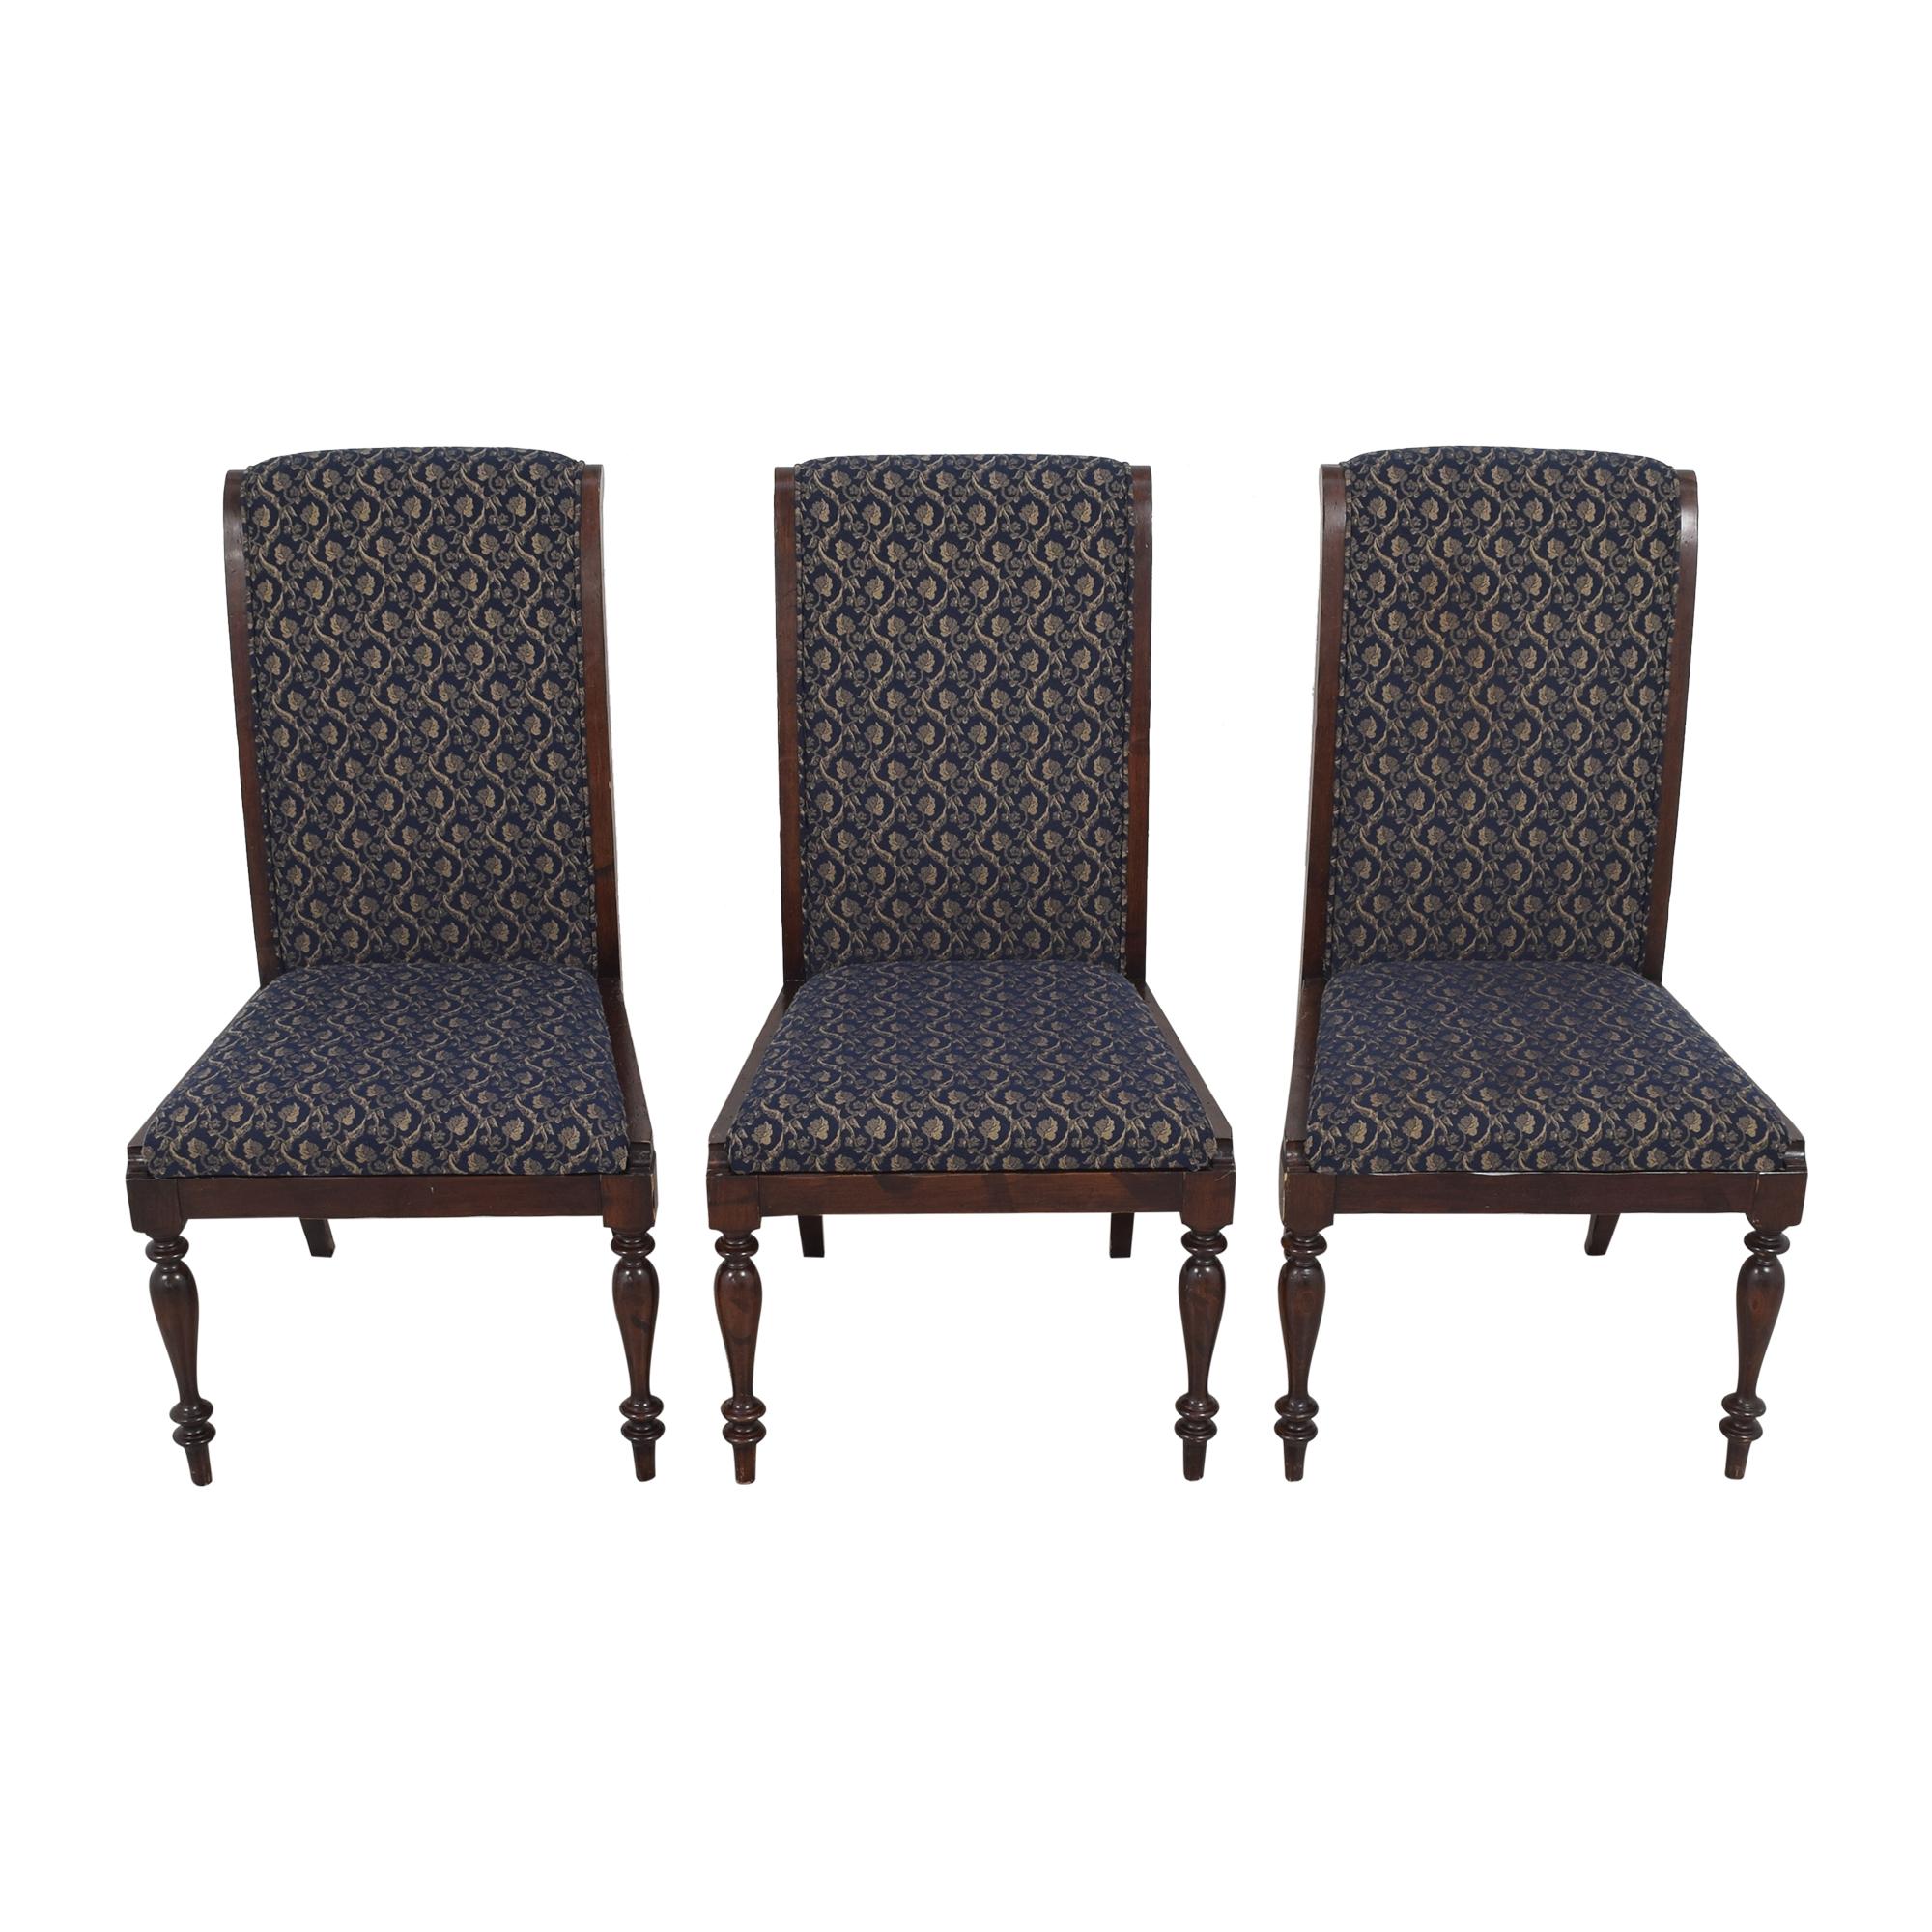 shop Sacchetto Fratelli Upholstered High Back Dining Chairs Sacchetto Fratelli Dining Chairs